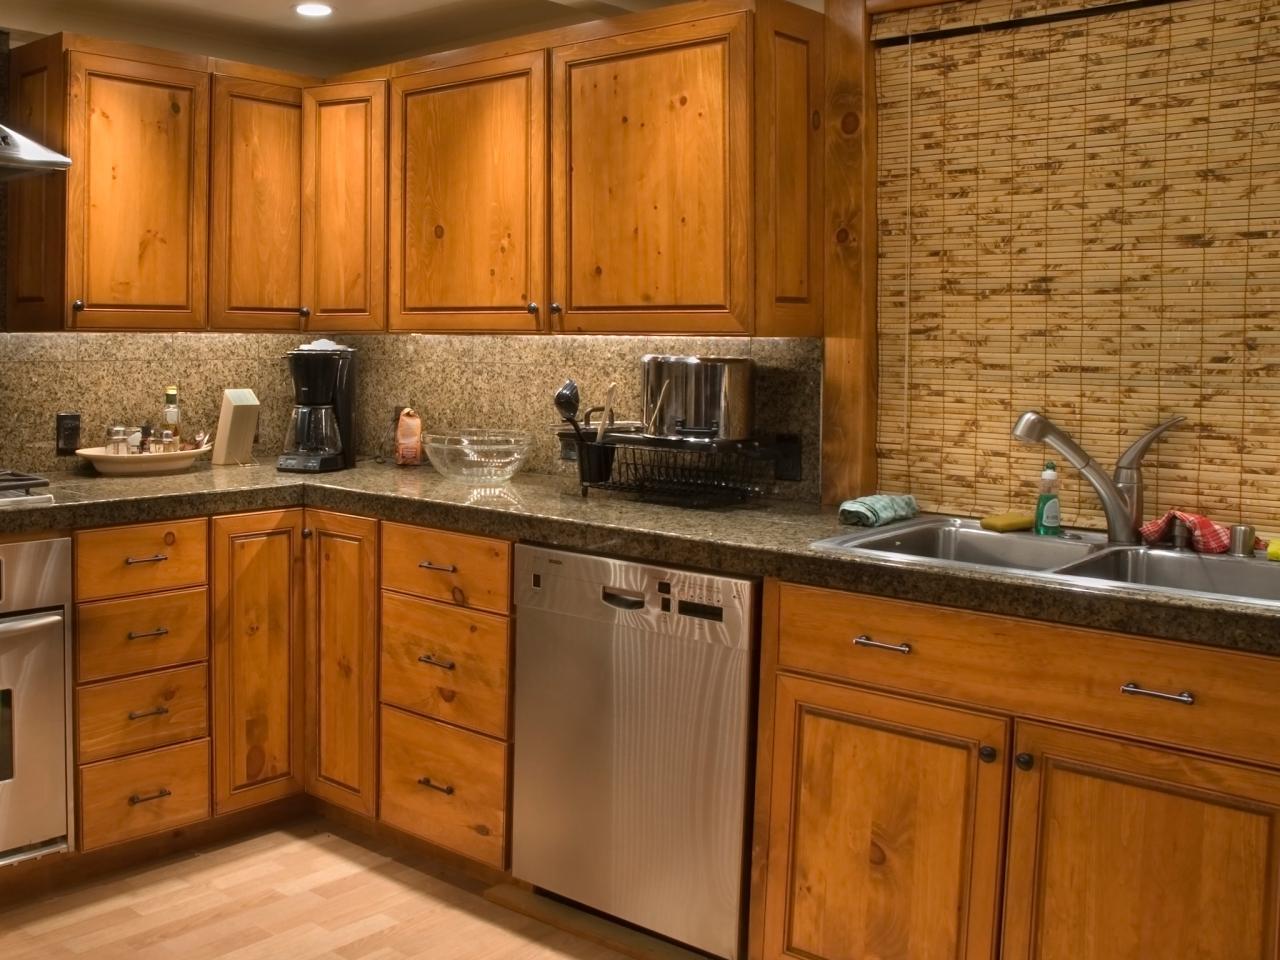 furniture u0026 rug thomasville cabinets shaker cabinets home depot